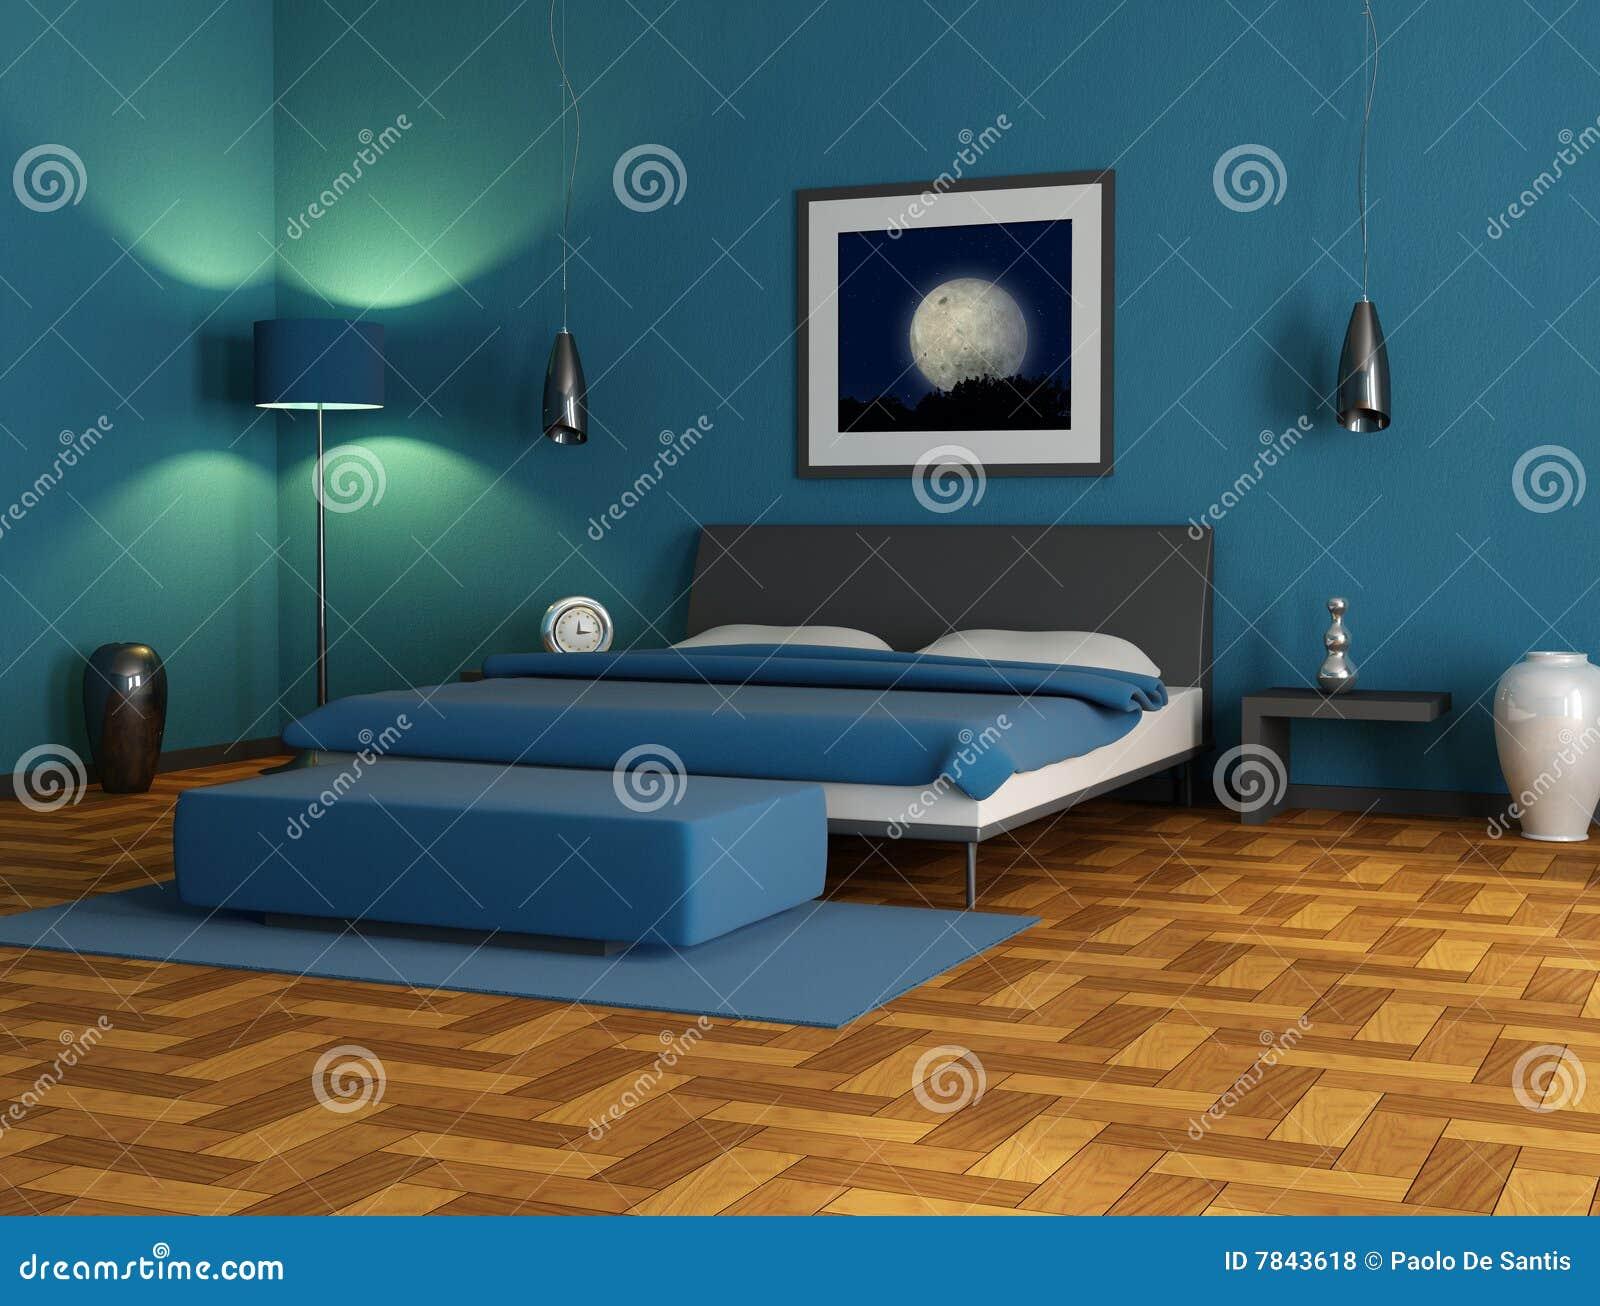 Blauwe Slaapkamer Muur : blauwe slaapkamer, digitaal kunstwerk. De ...